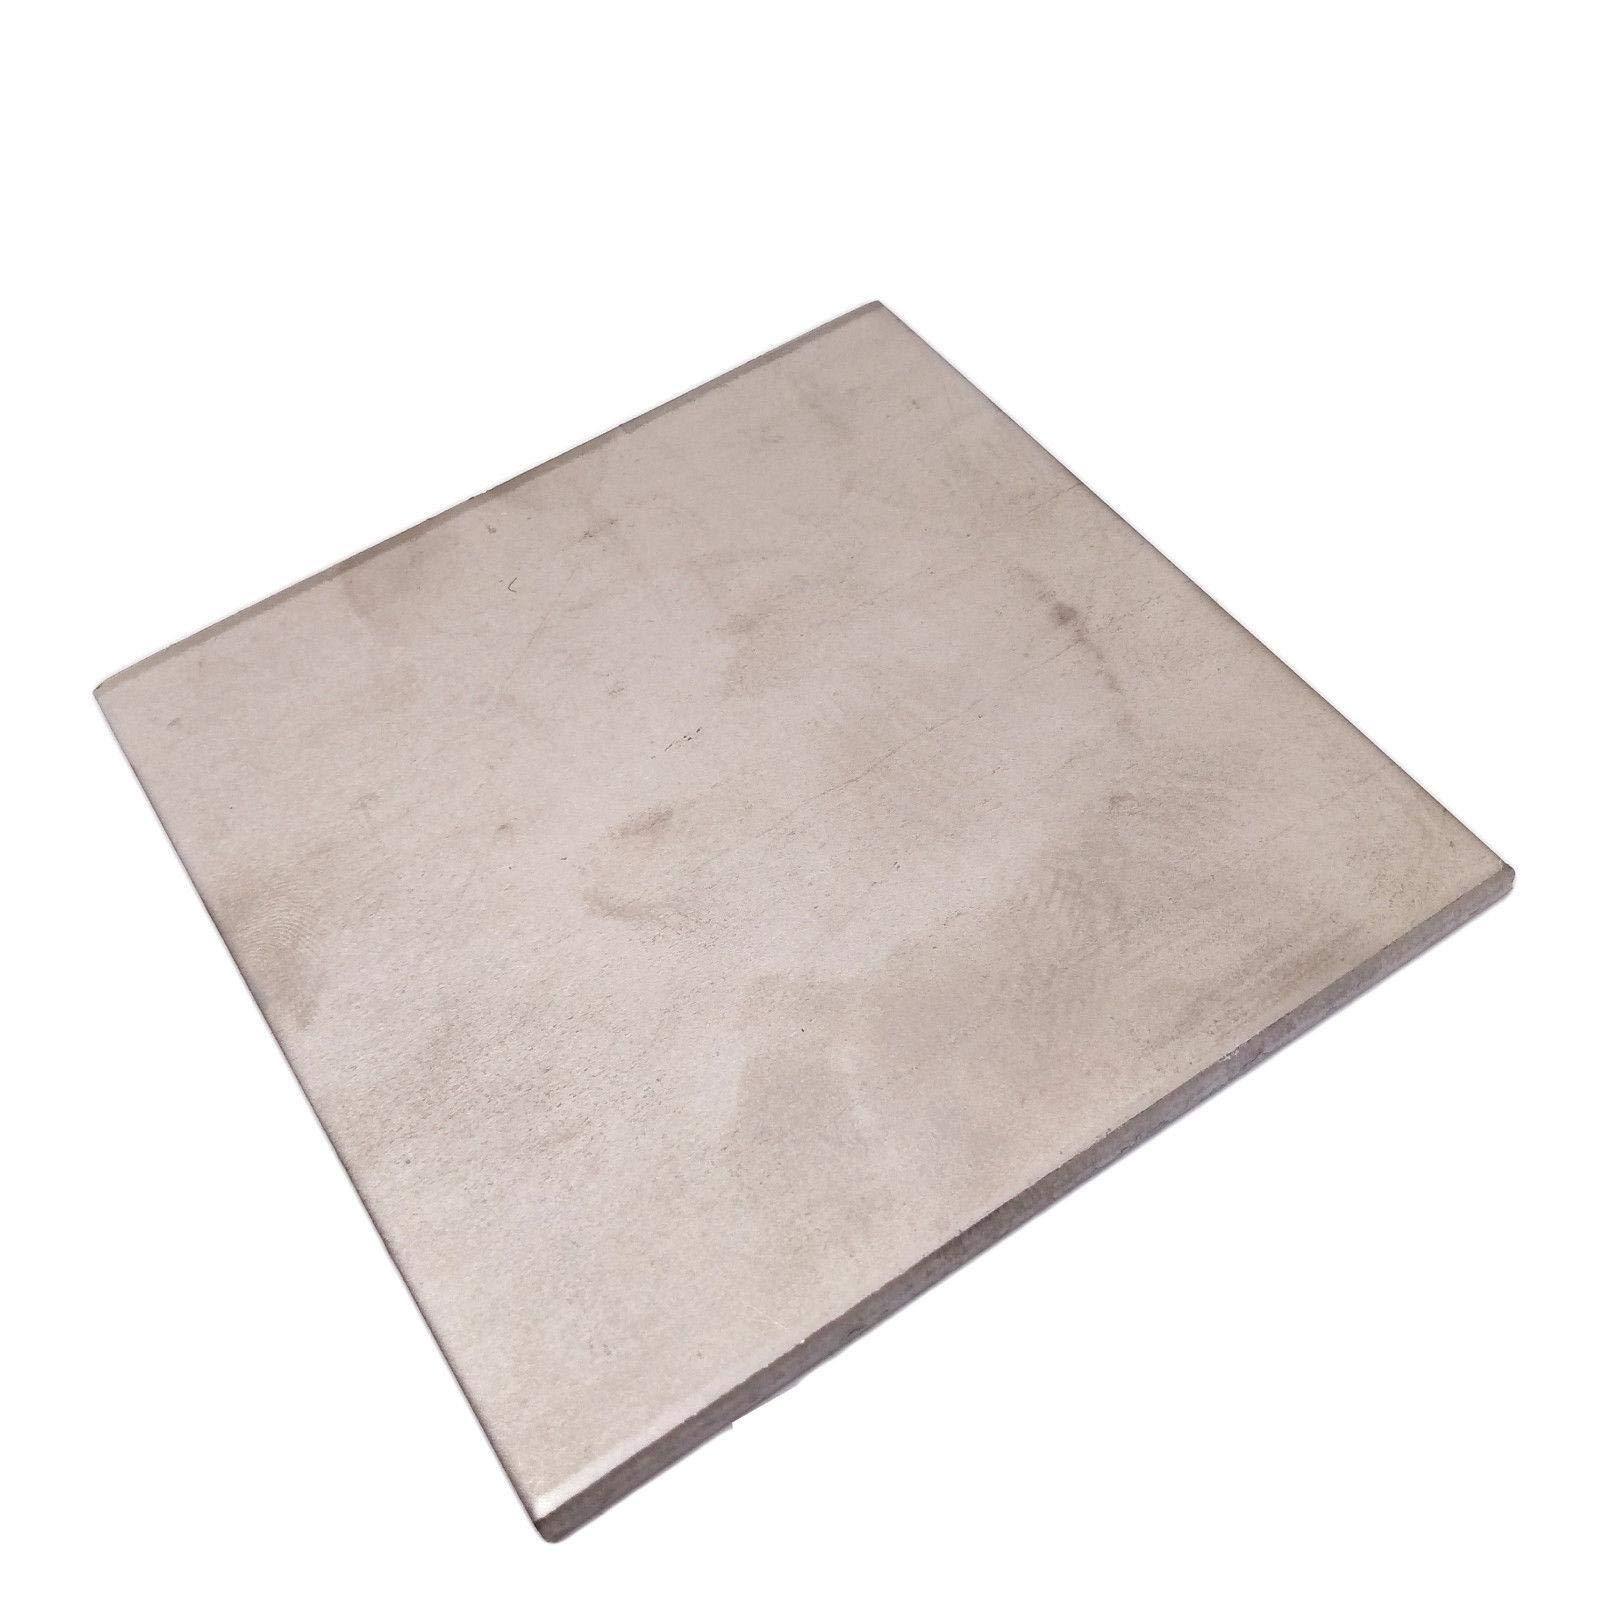 4mm x 100mm x 100mm Titanium Plate Ti Titan TC4 Gr5 Plate Sheet Foil by Yodaoke